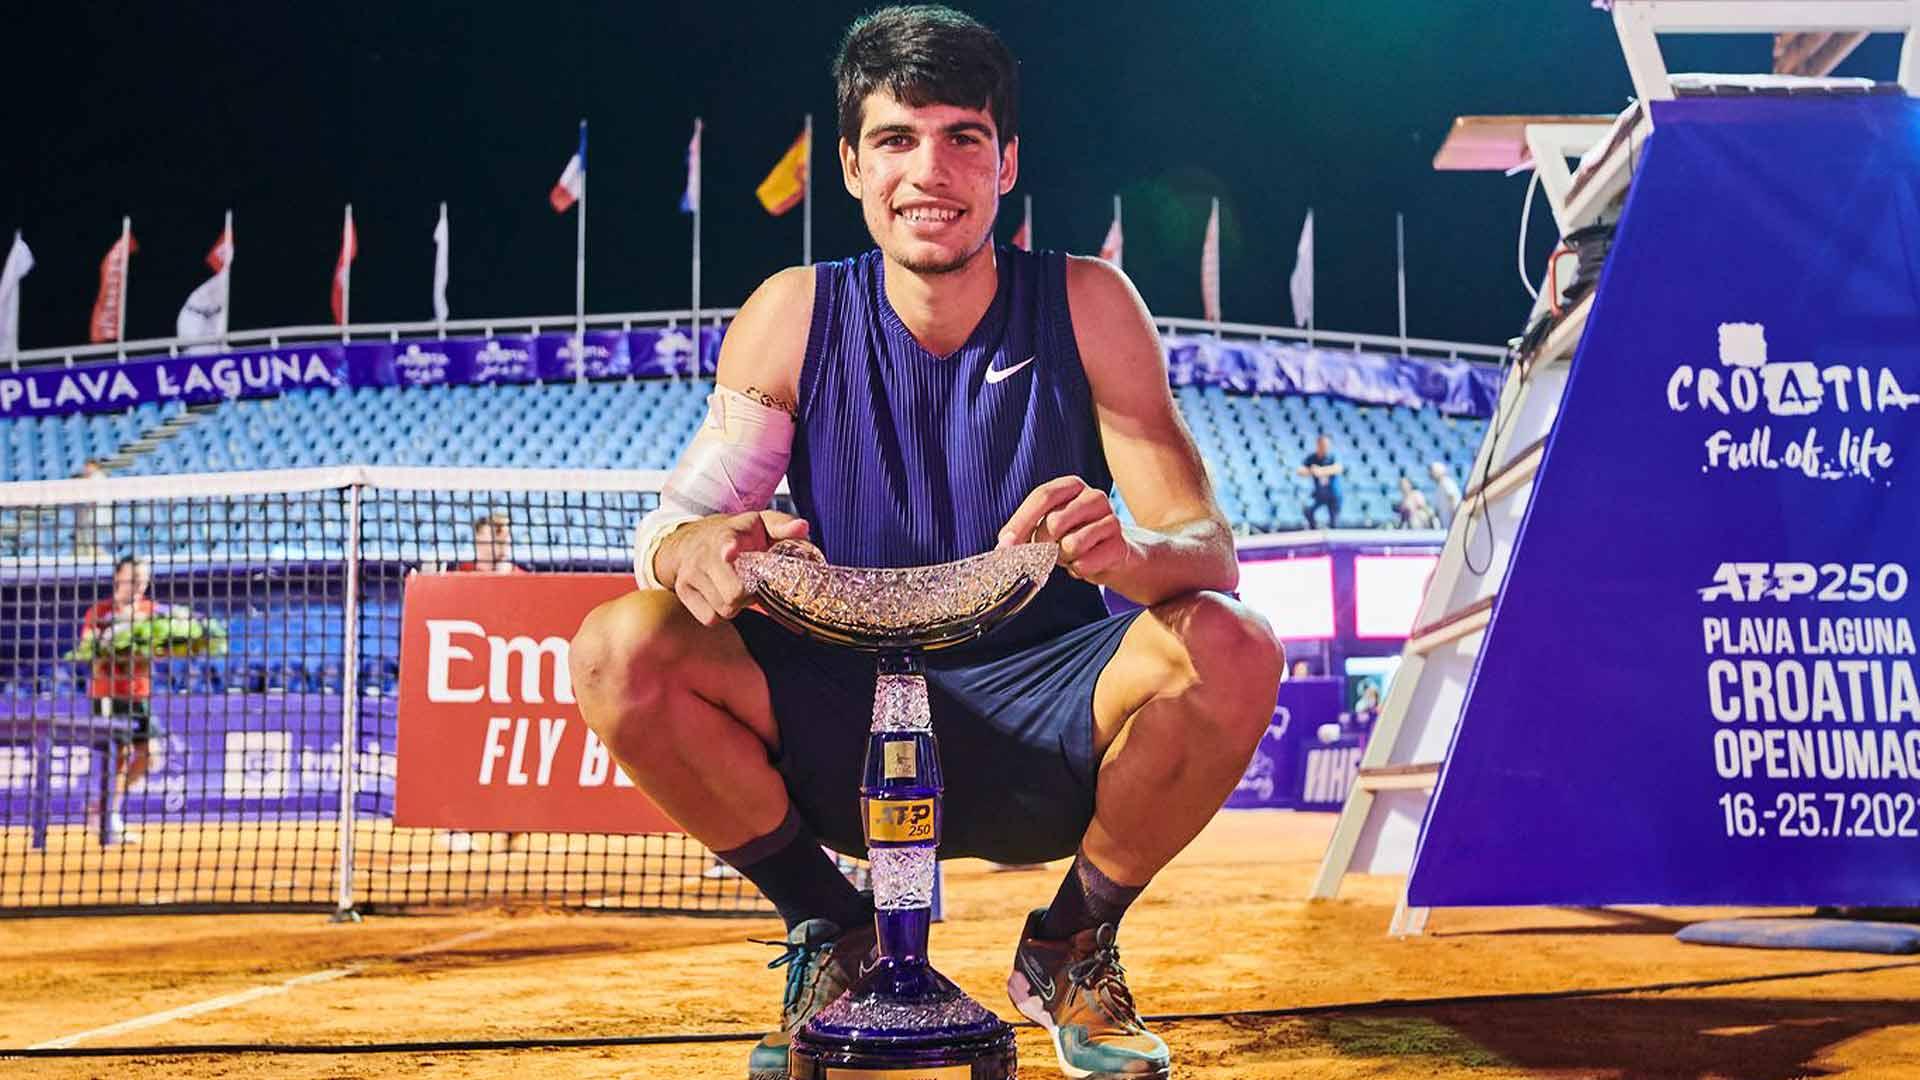 alcaraz umag 2021 trophy - 18-letni Alcaraz v Umagu do prvega naslova ATP